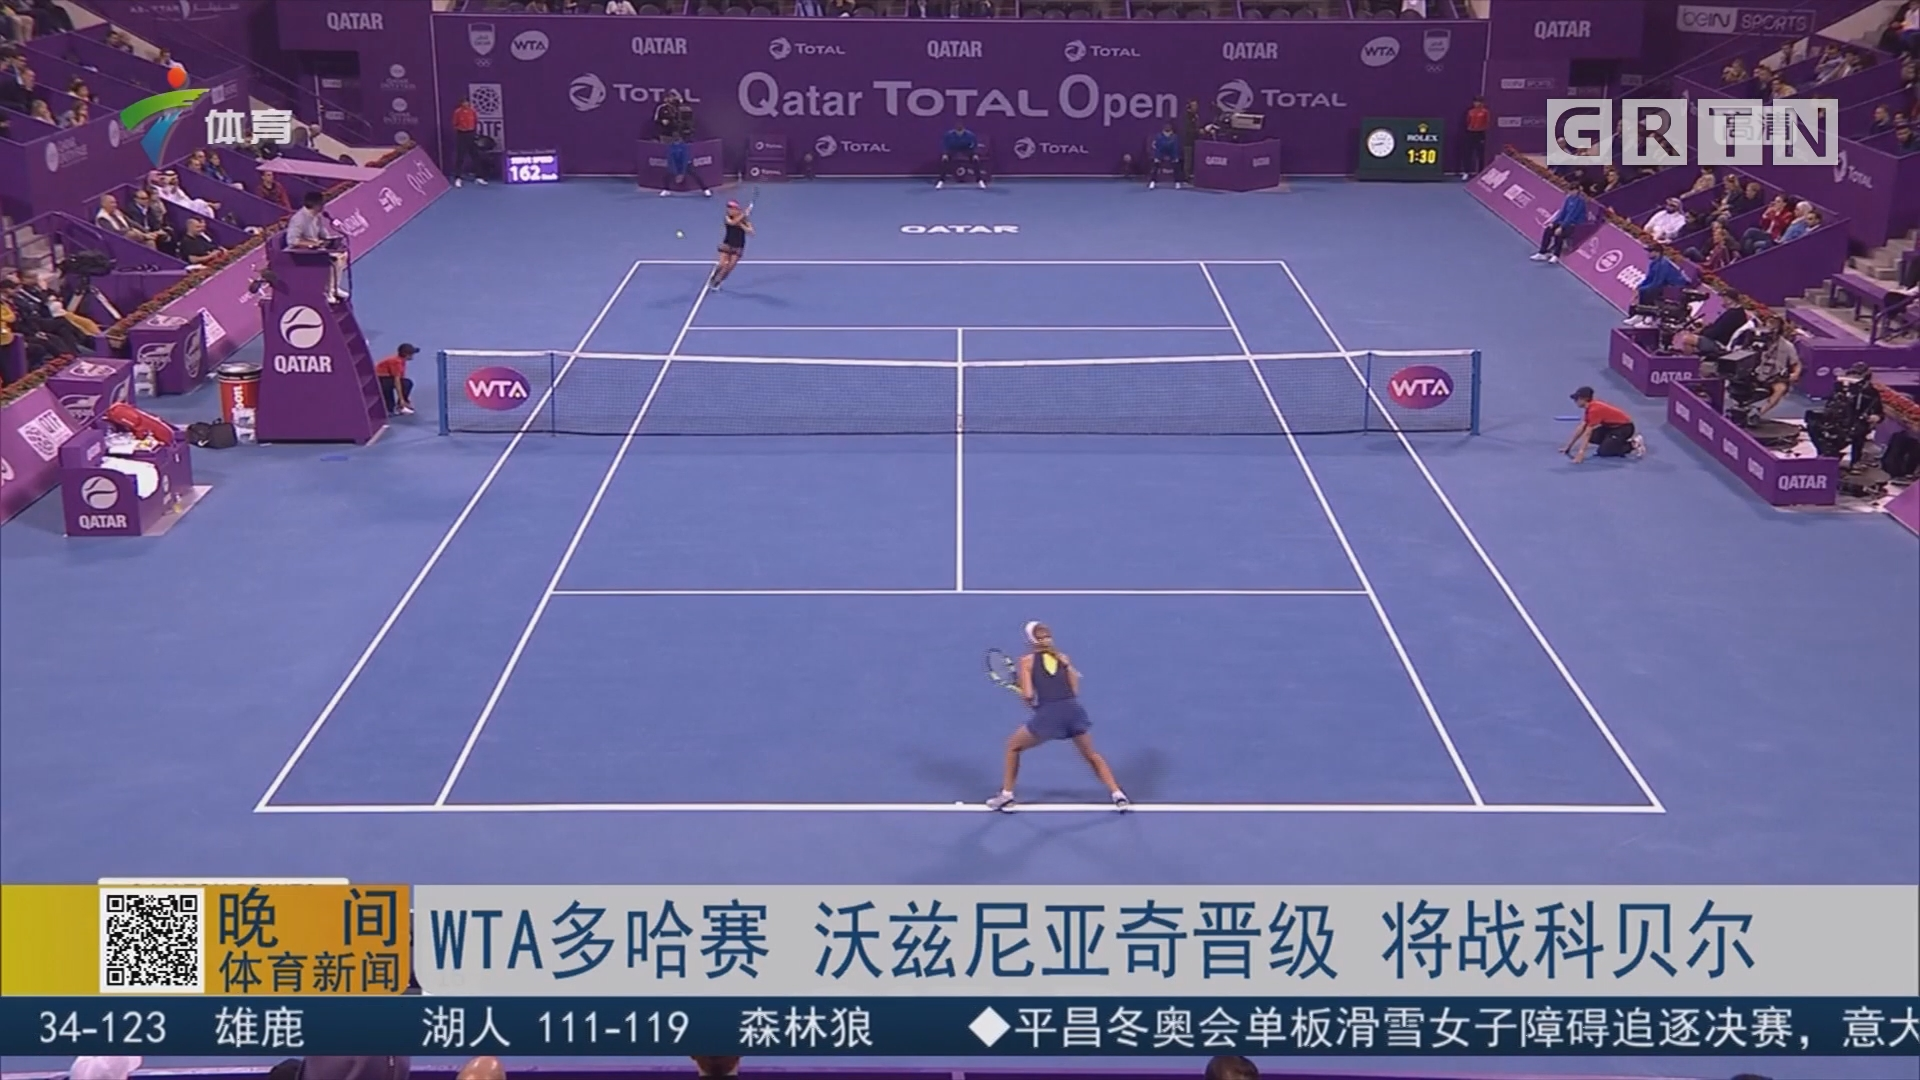 WTA多哈赛 沃兹尼亚奇晋级 将战科贝尔